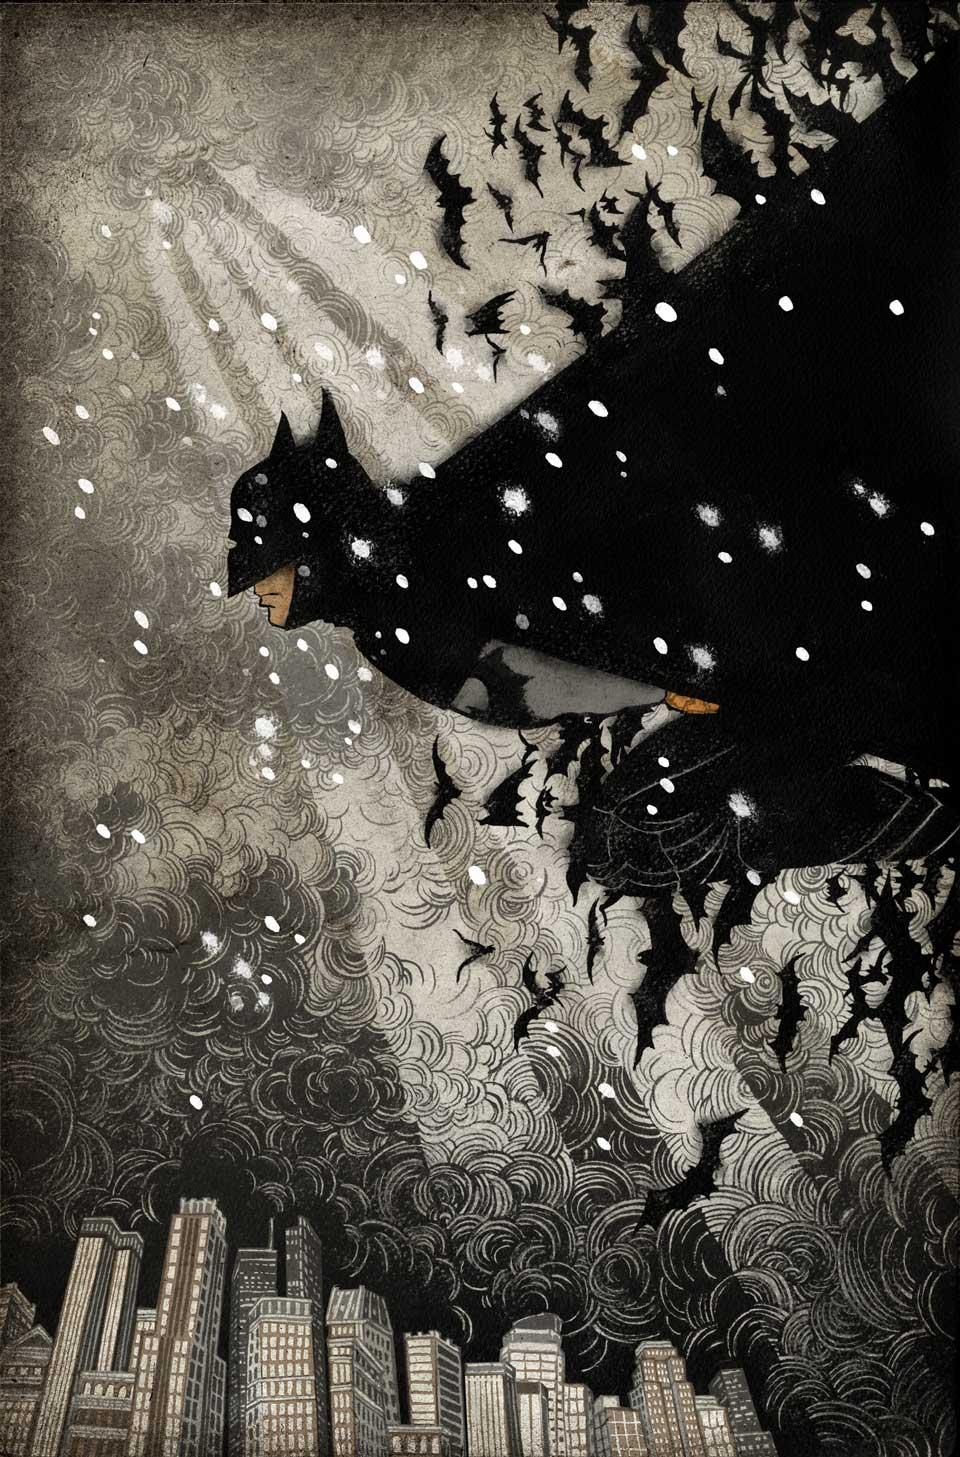 Yuko Shimizu - BATMAN Detective Comics cover - batman yuko shimizu dc comics dc universe cover